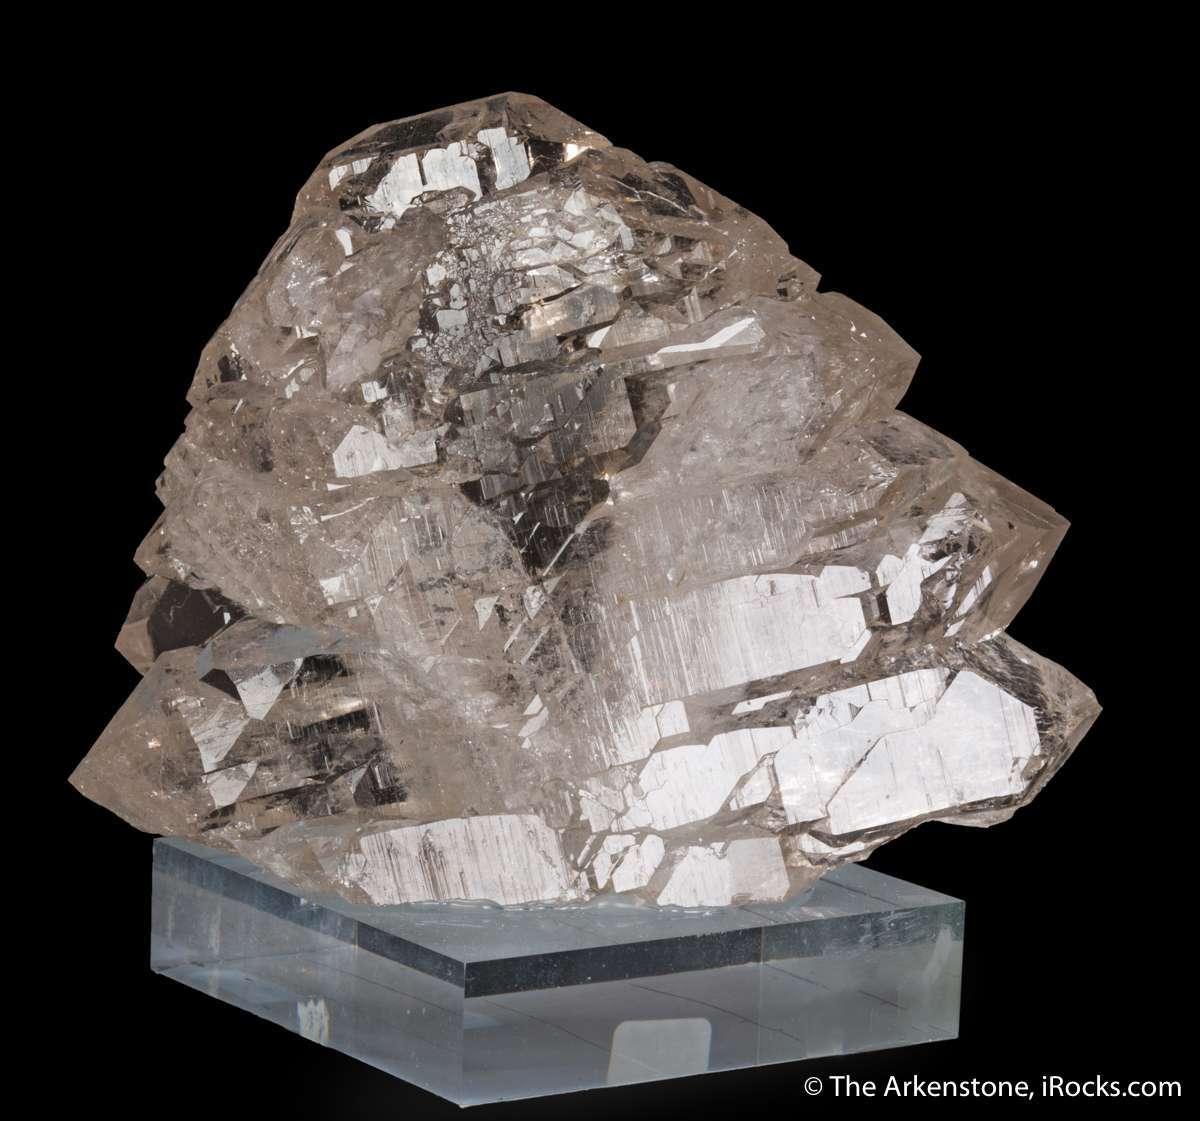 A sparkling water clear gem quartz showing dramatic Gwindel twisted